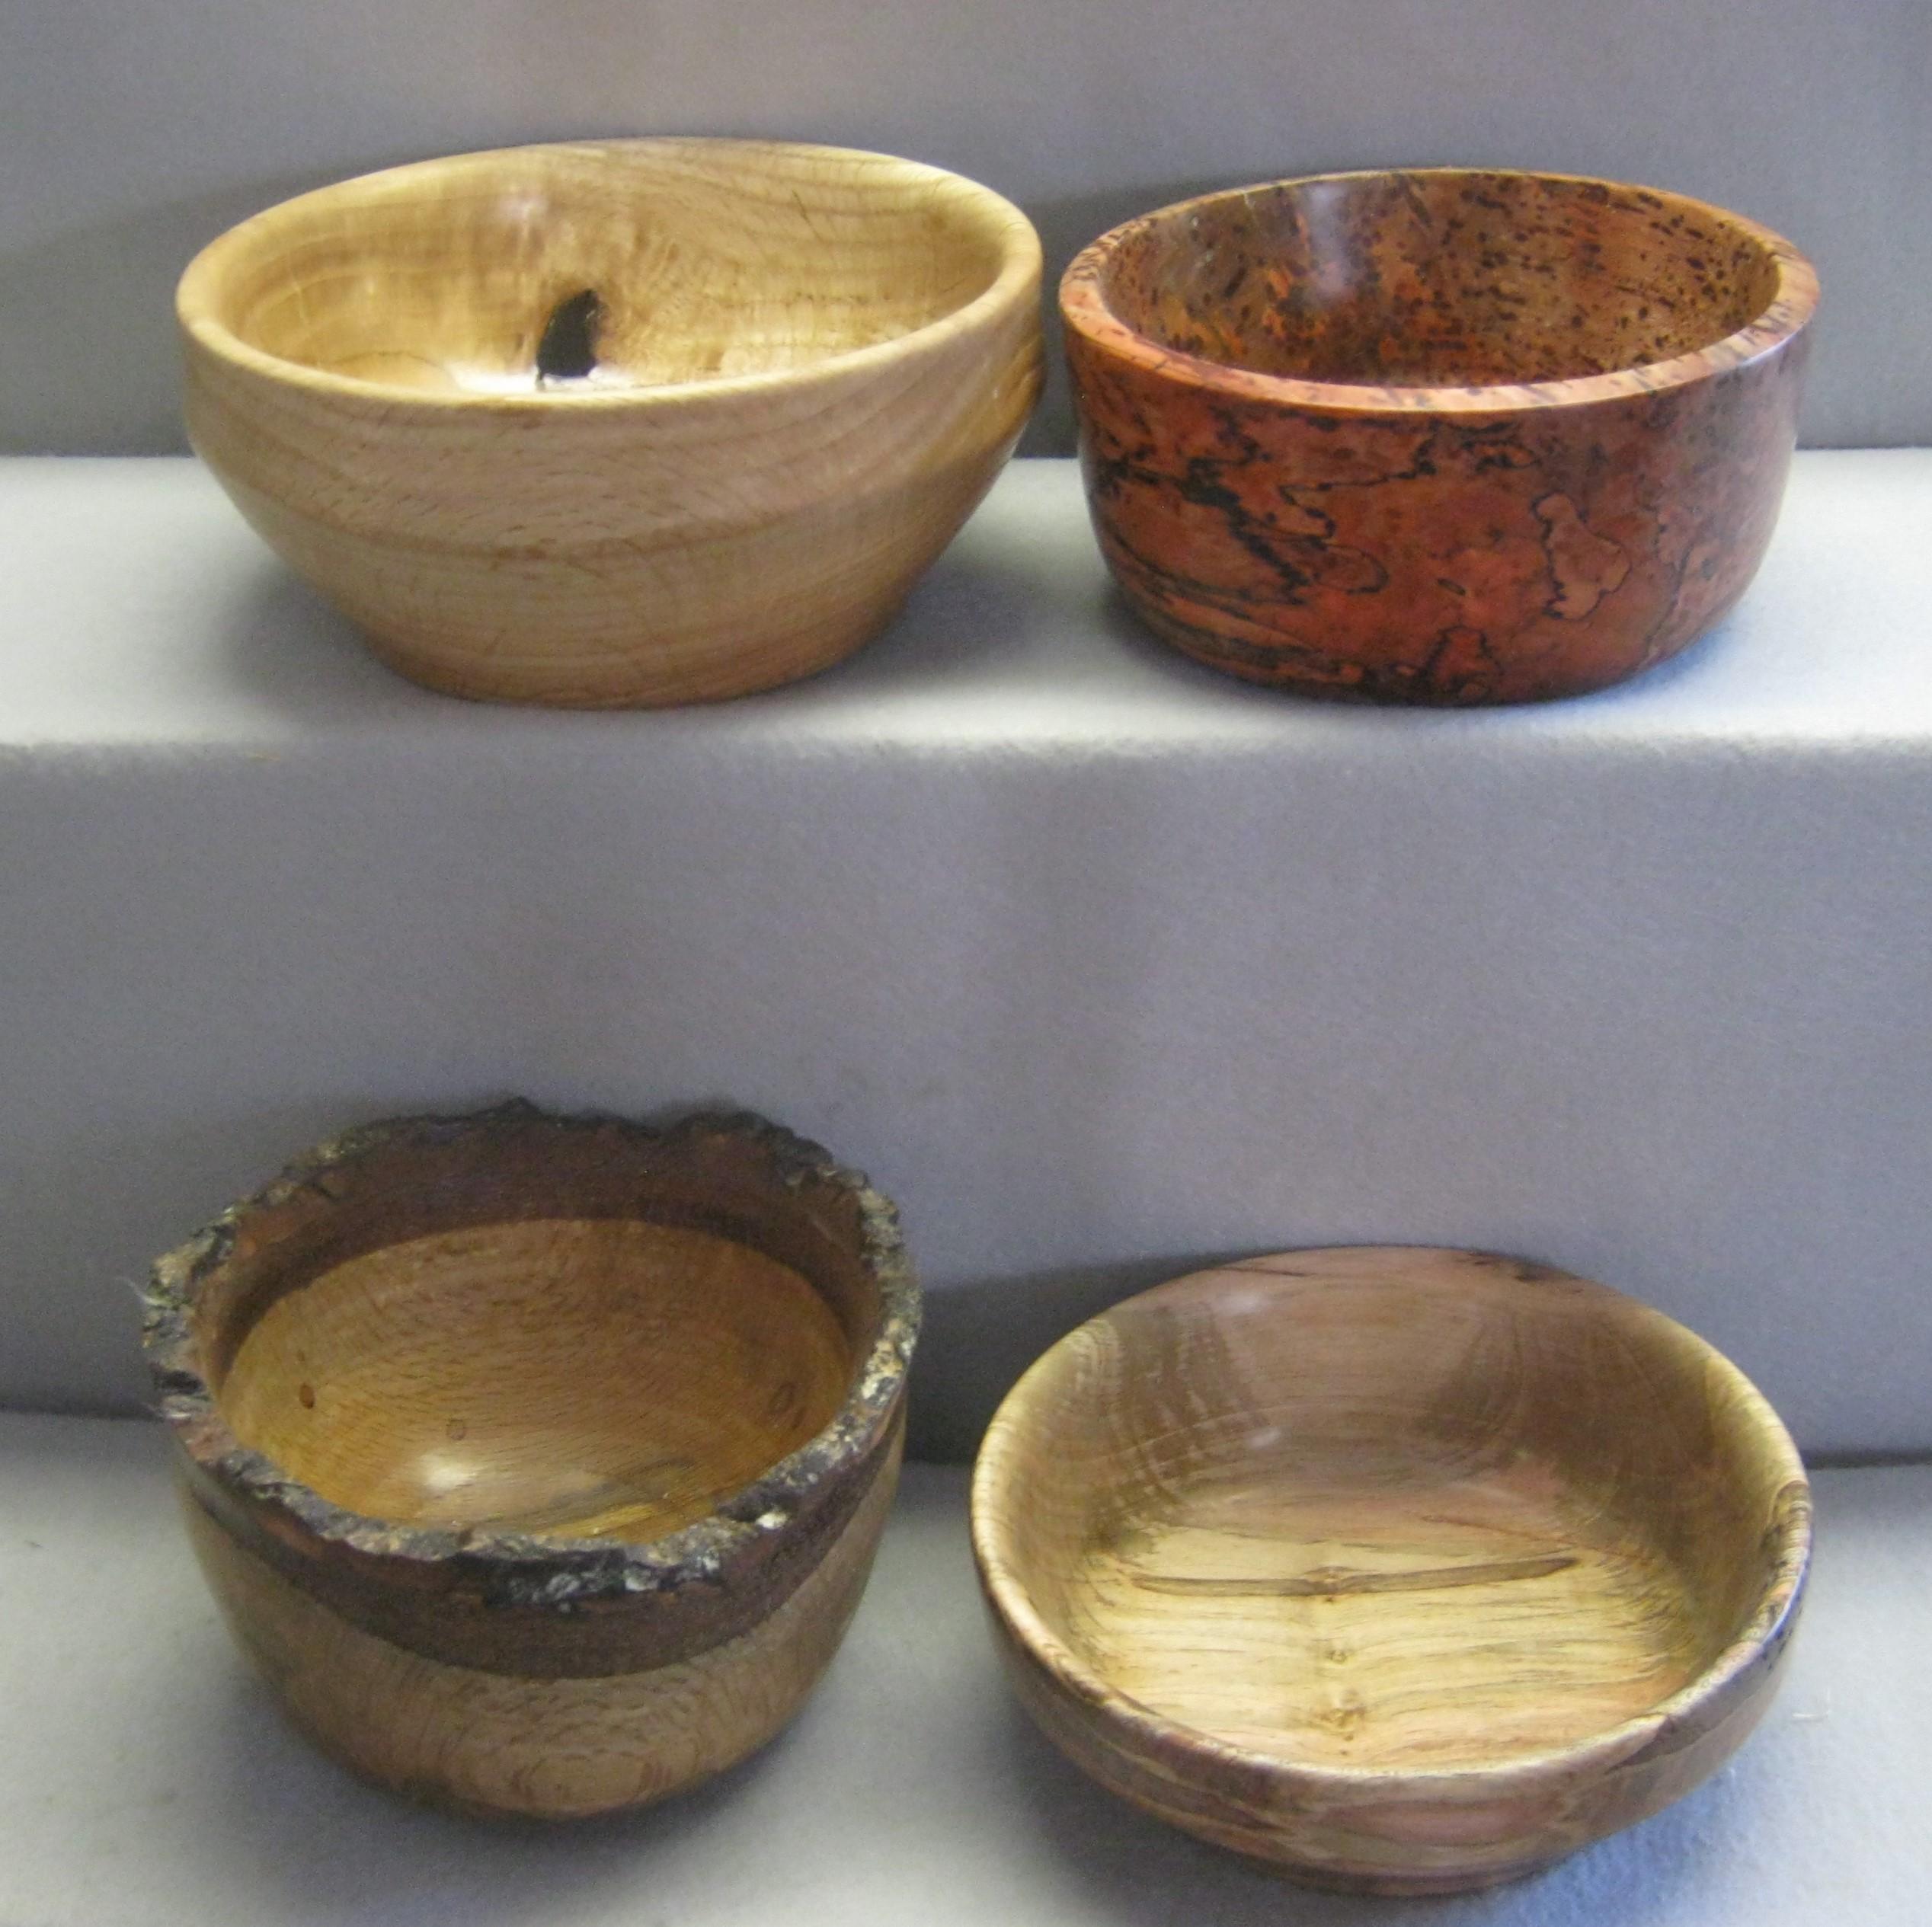 Decor bowls-3